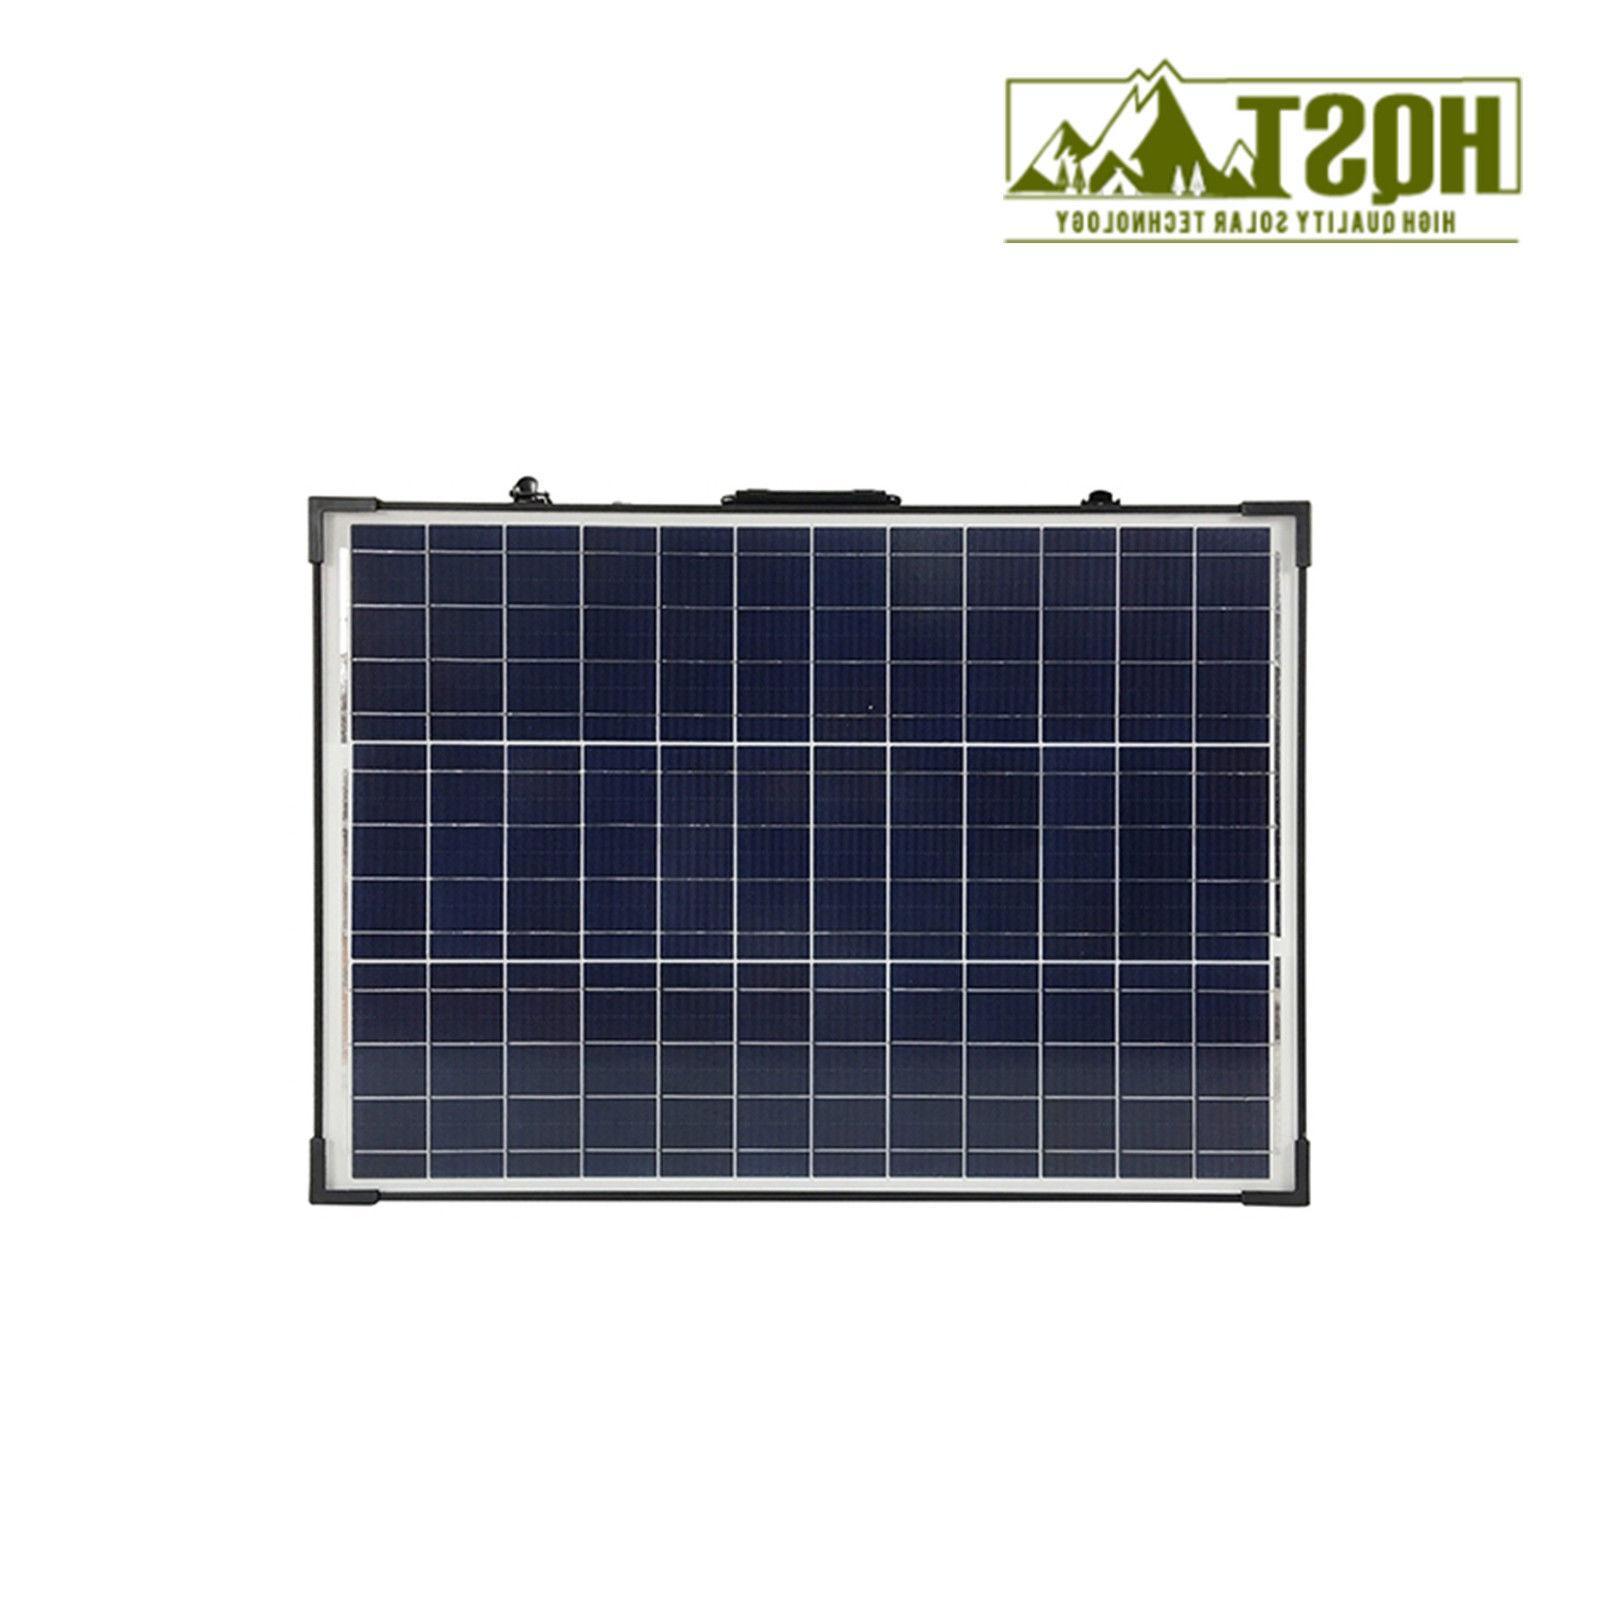 100W 12V Solar Suitcase Portable